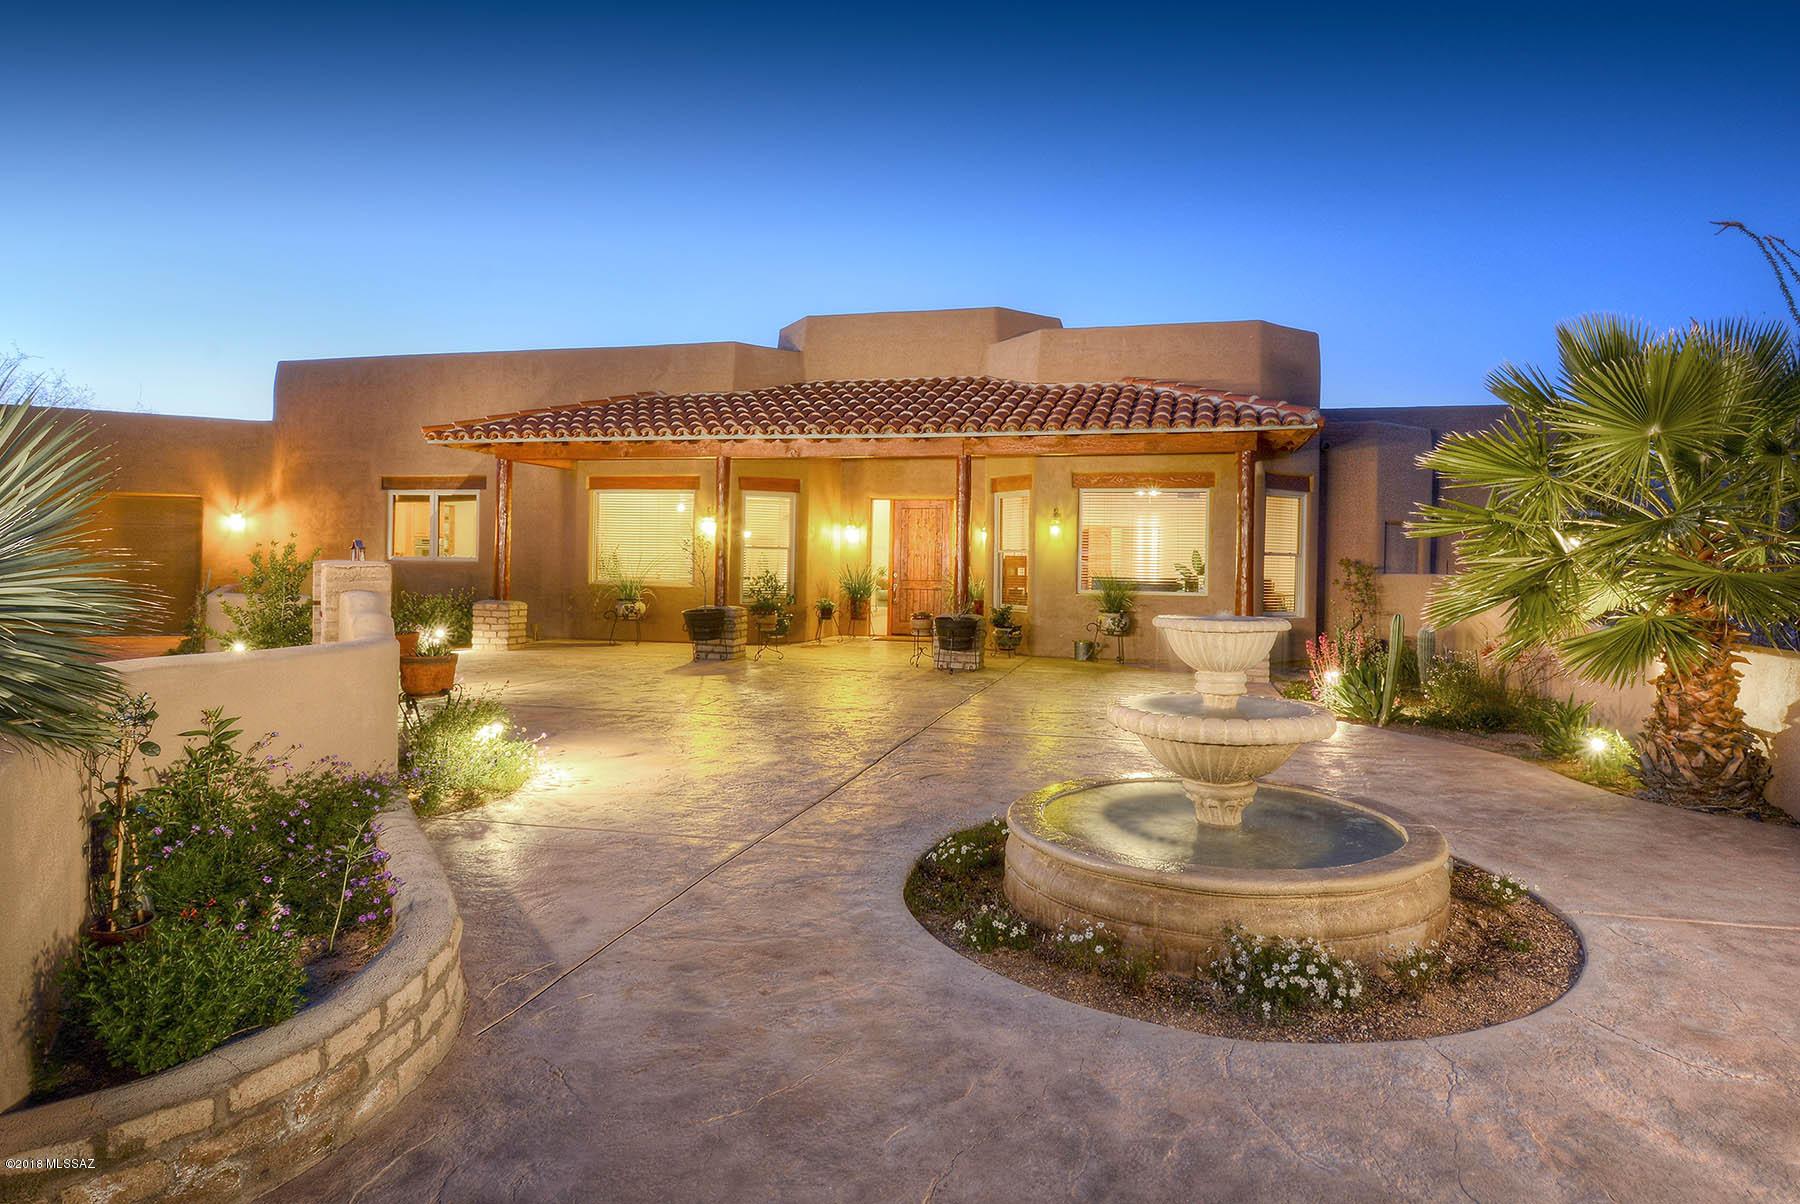 Photo of 12751 E Camino Ancho, Tucson, AZ 85749